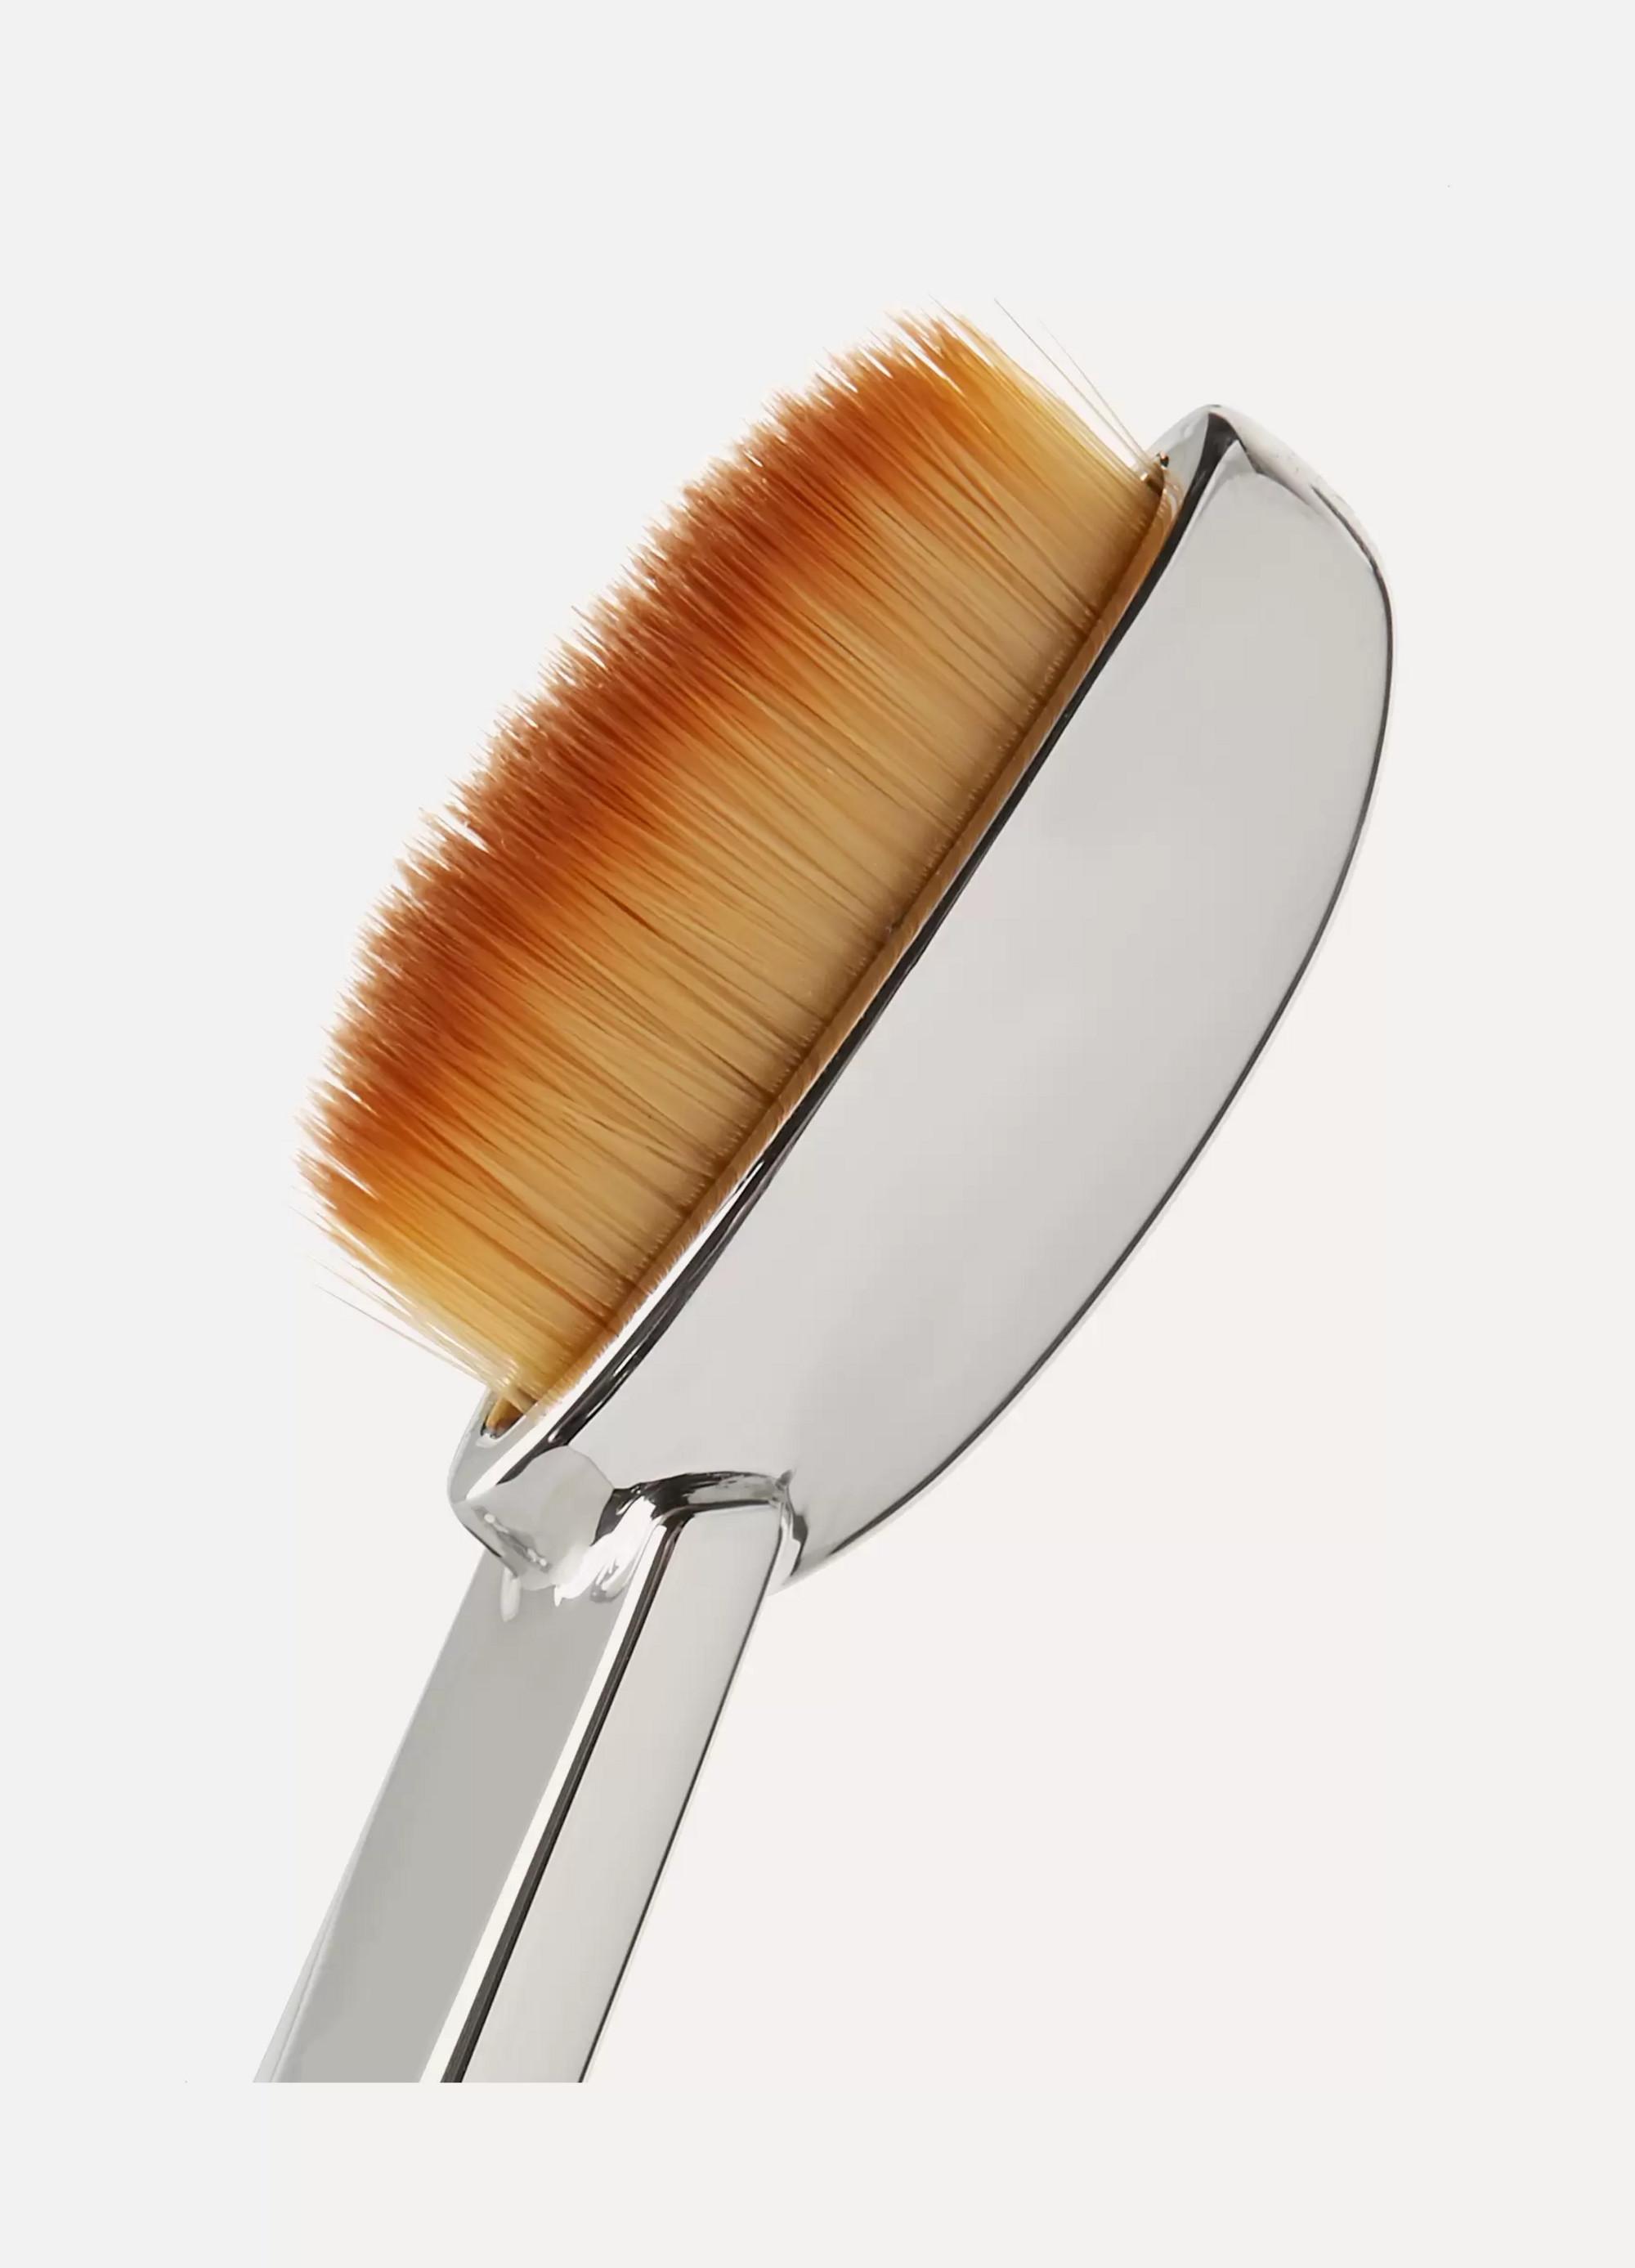 Artis Brush Next Generation Elite Mirror Linear 1 Brush